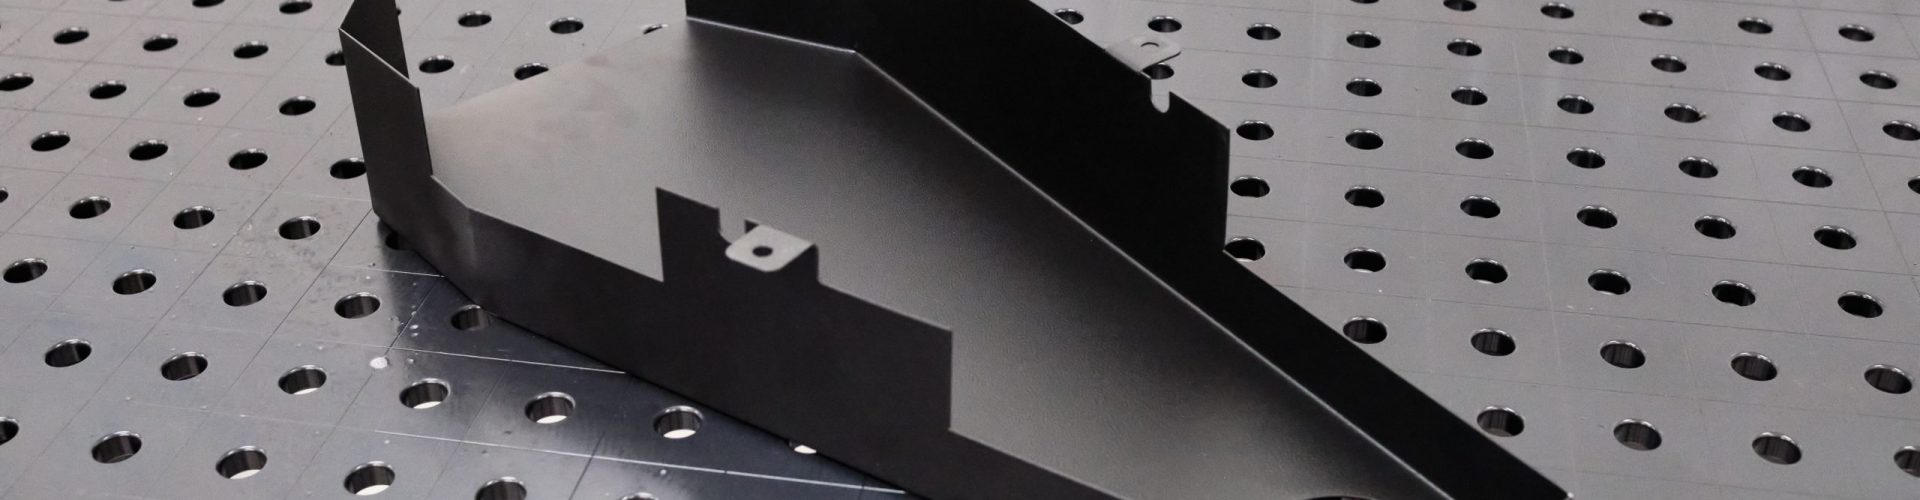 debitare-laser-abkant-prelucrari-metale-cluj 10